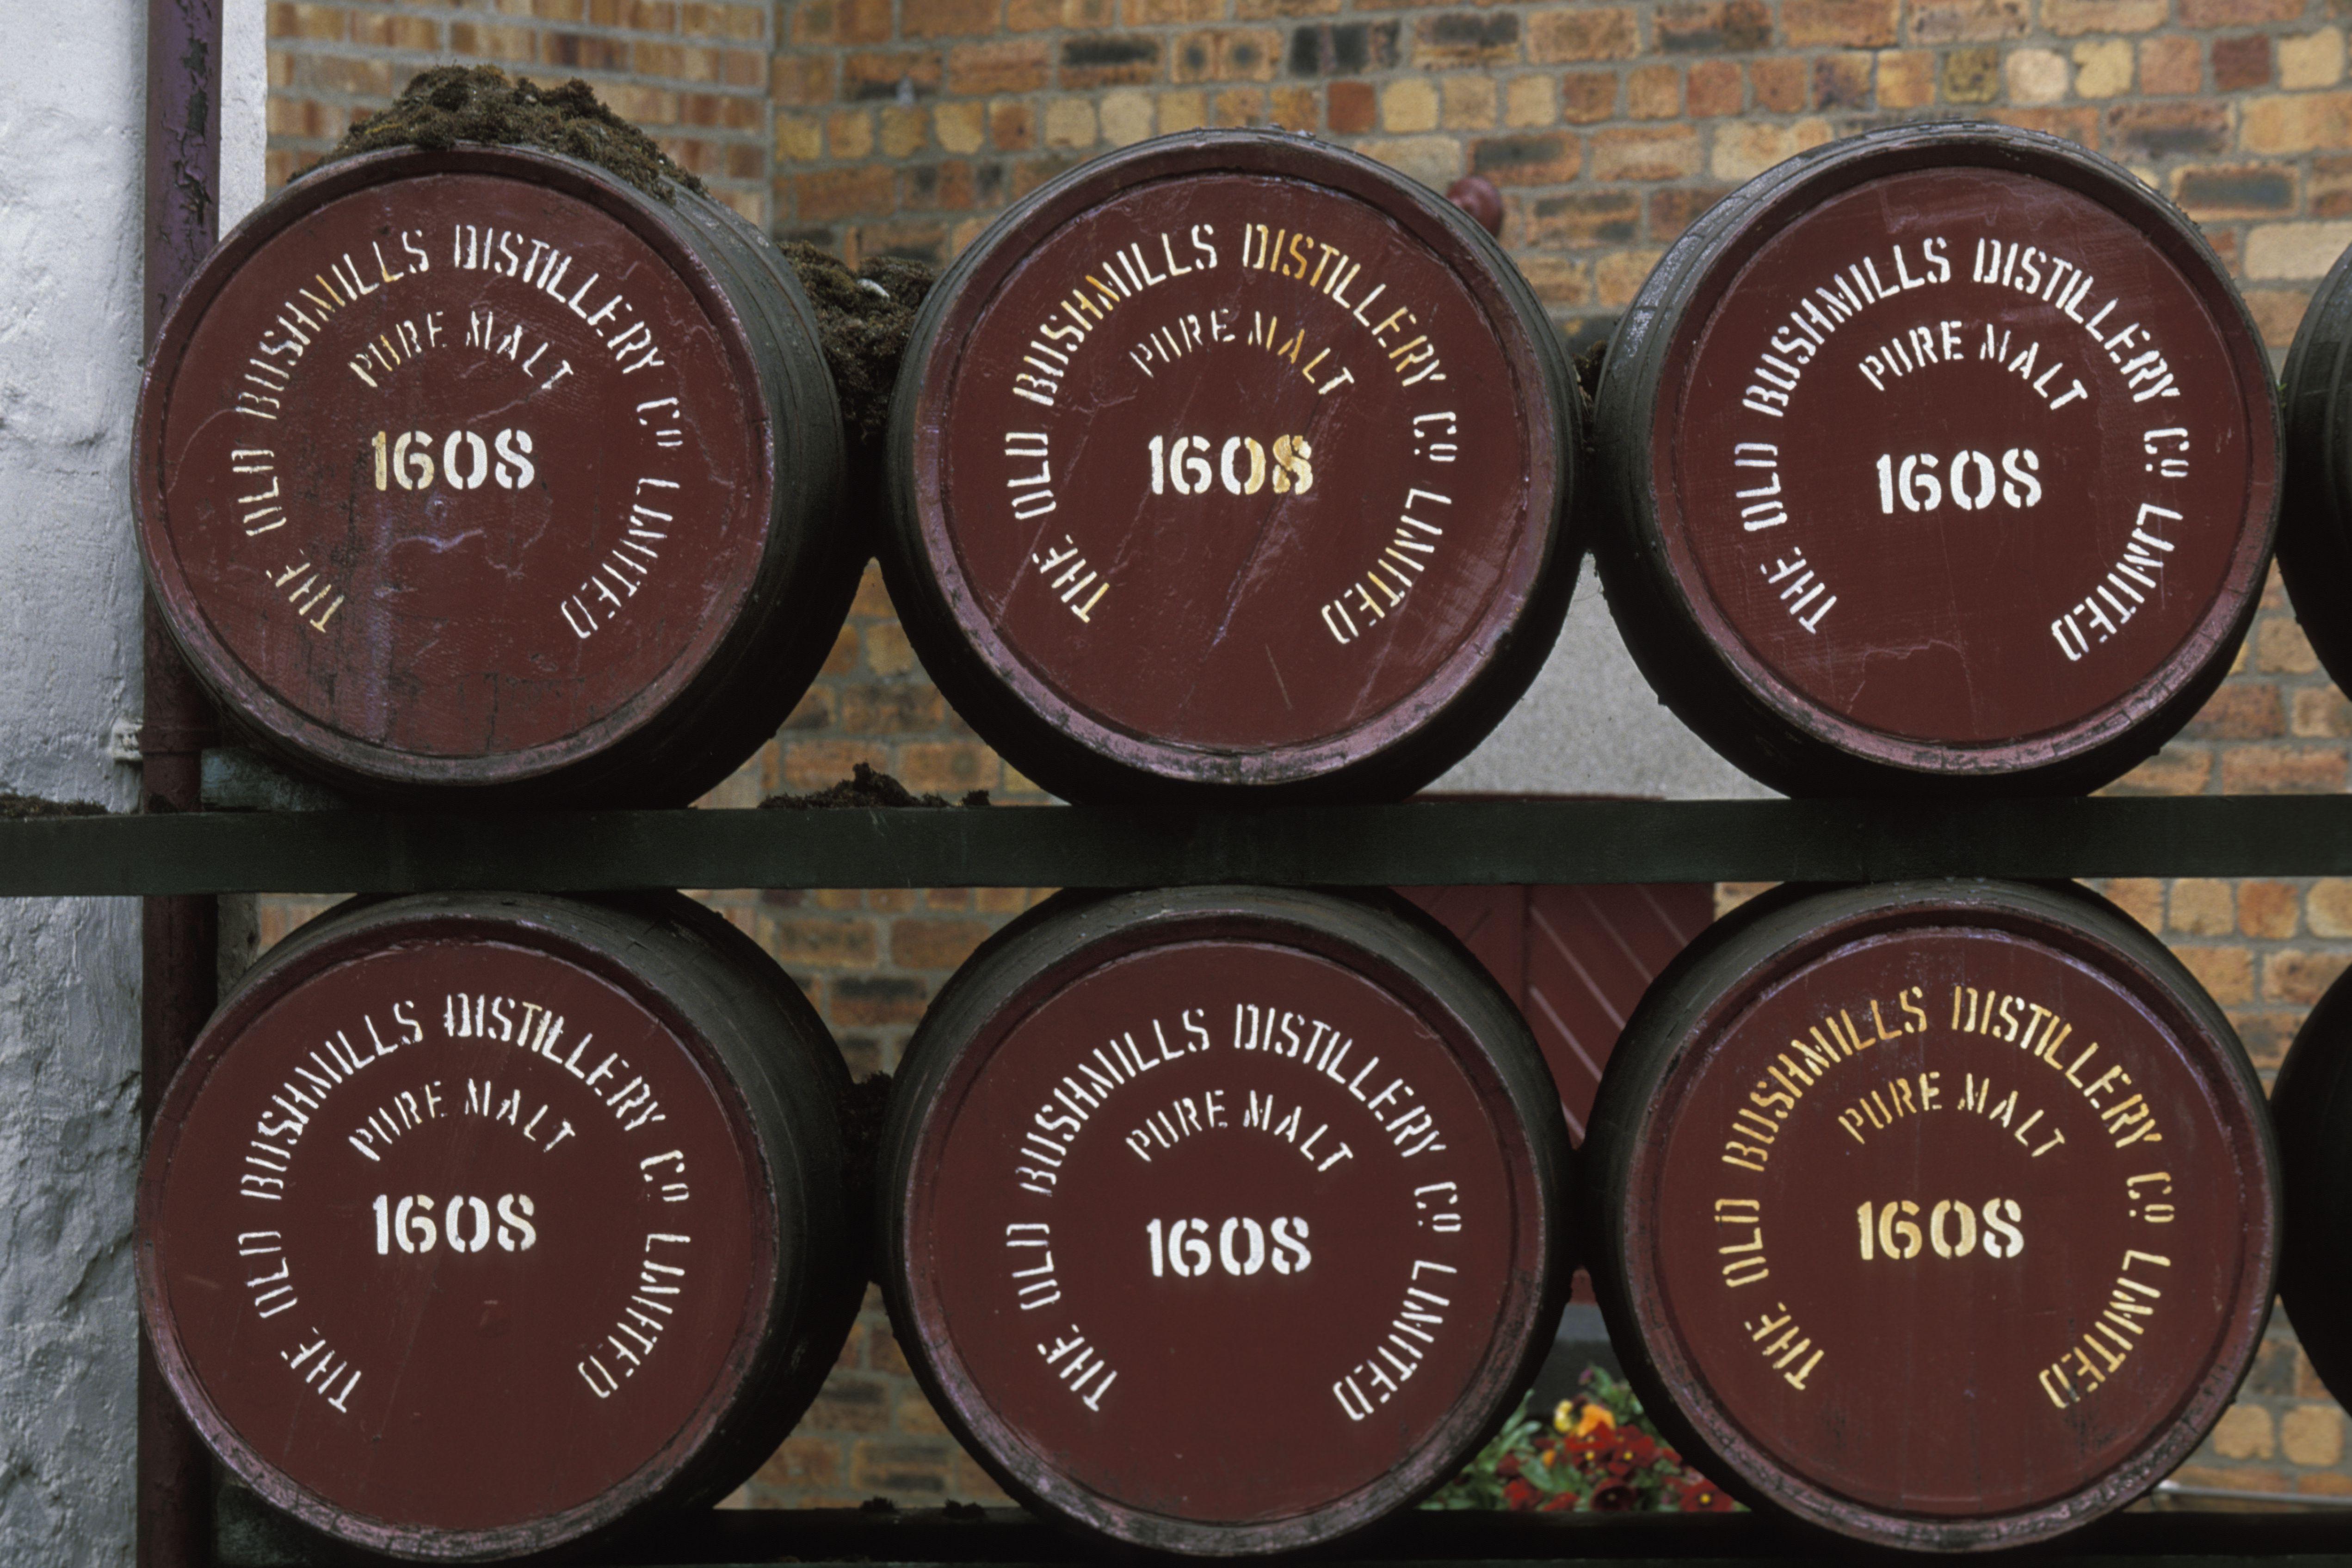 Barrels of pure malt whiskey at Bushmills Distillery.